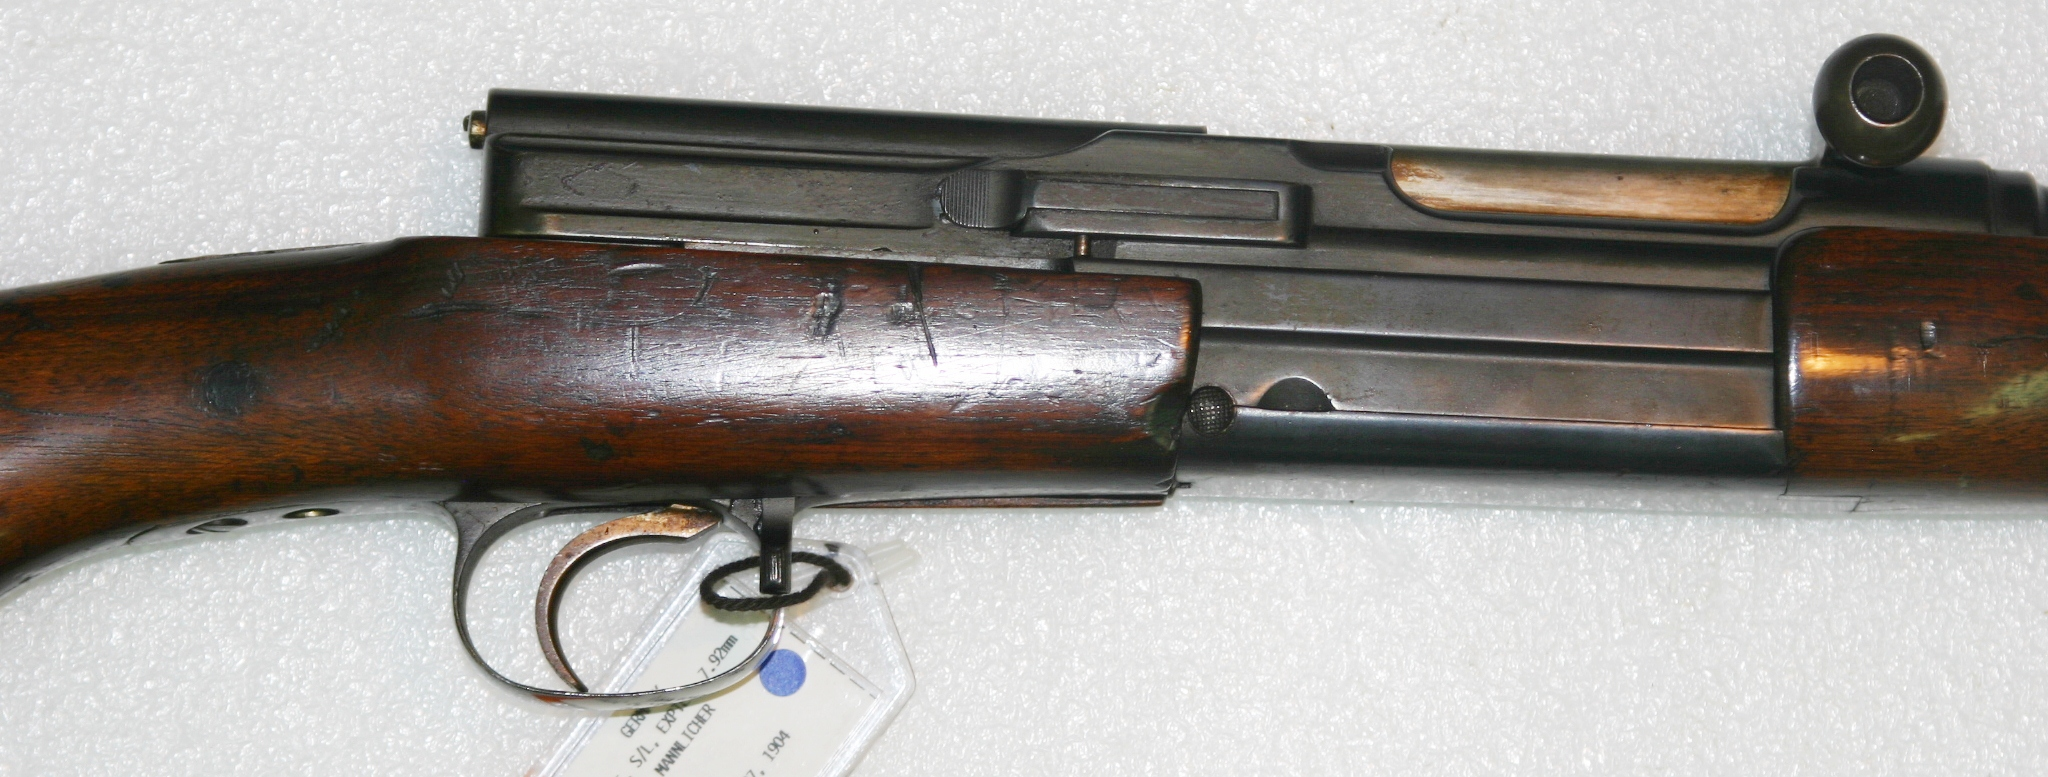 Mannlicher 1905 Experimental Self-Loading Rifle – Forgotten